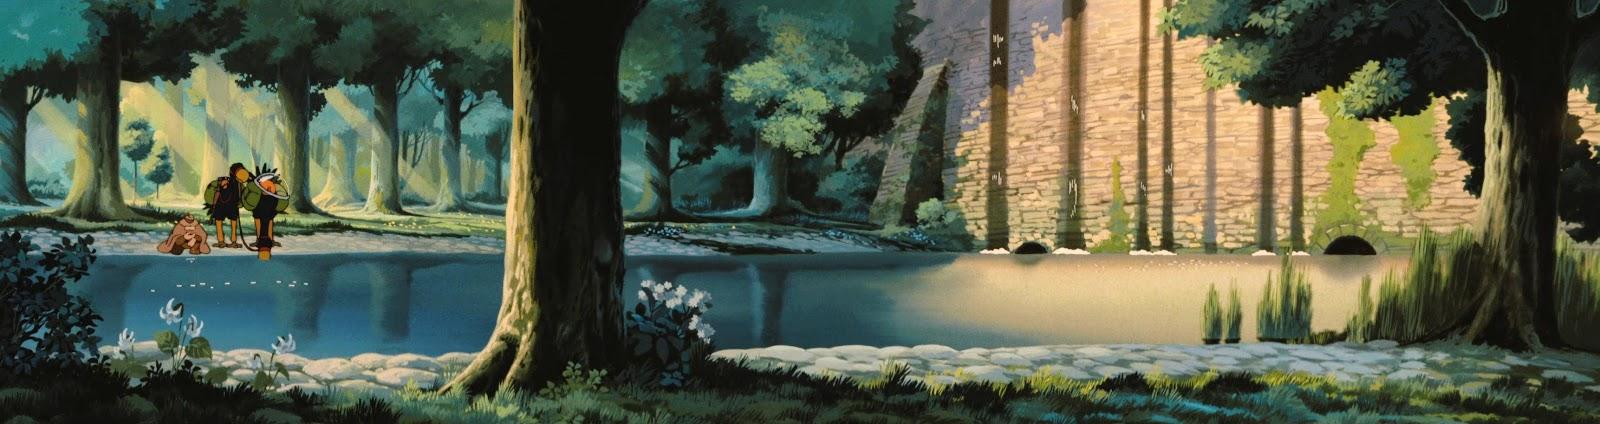 My Neighbor Totoro Wallpapers